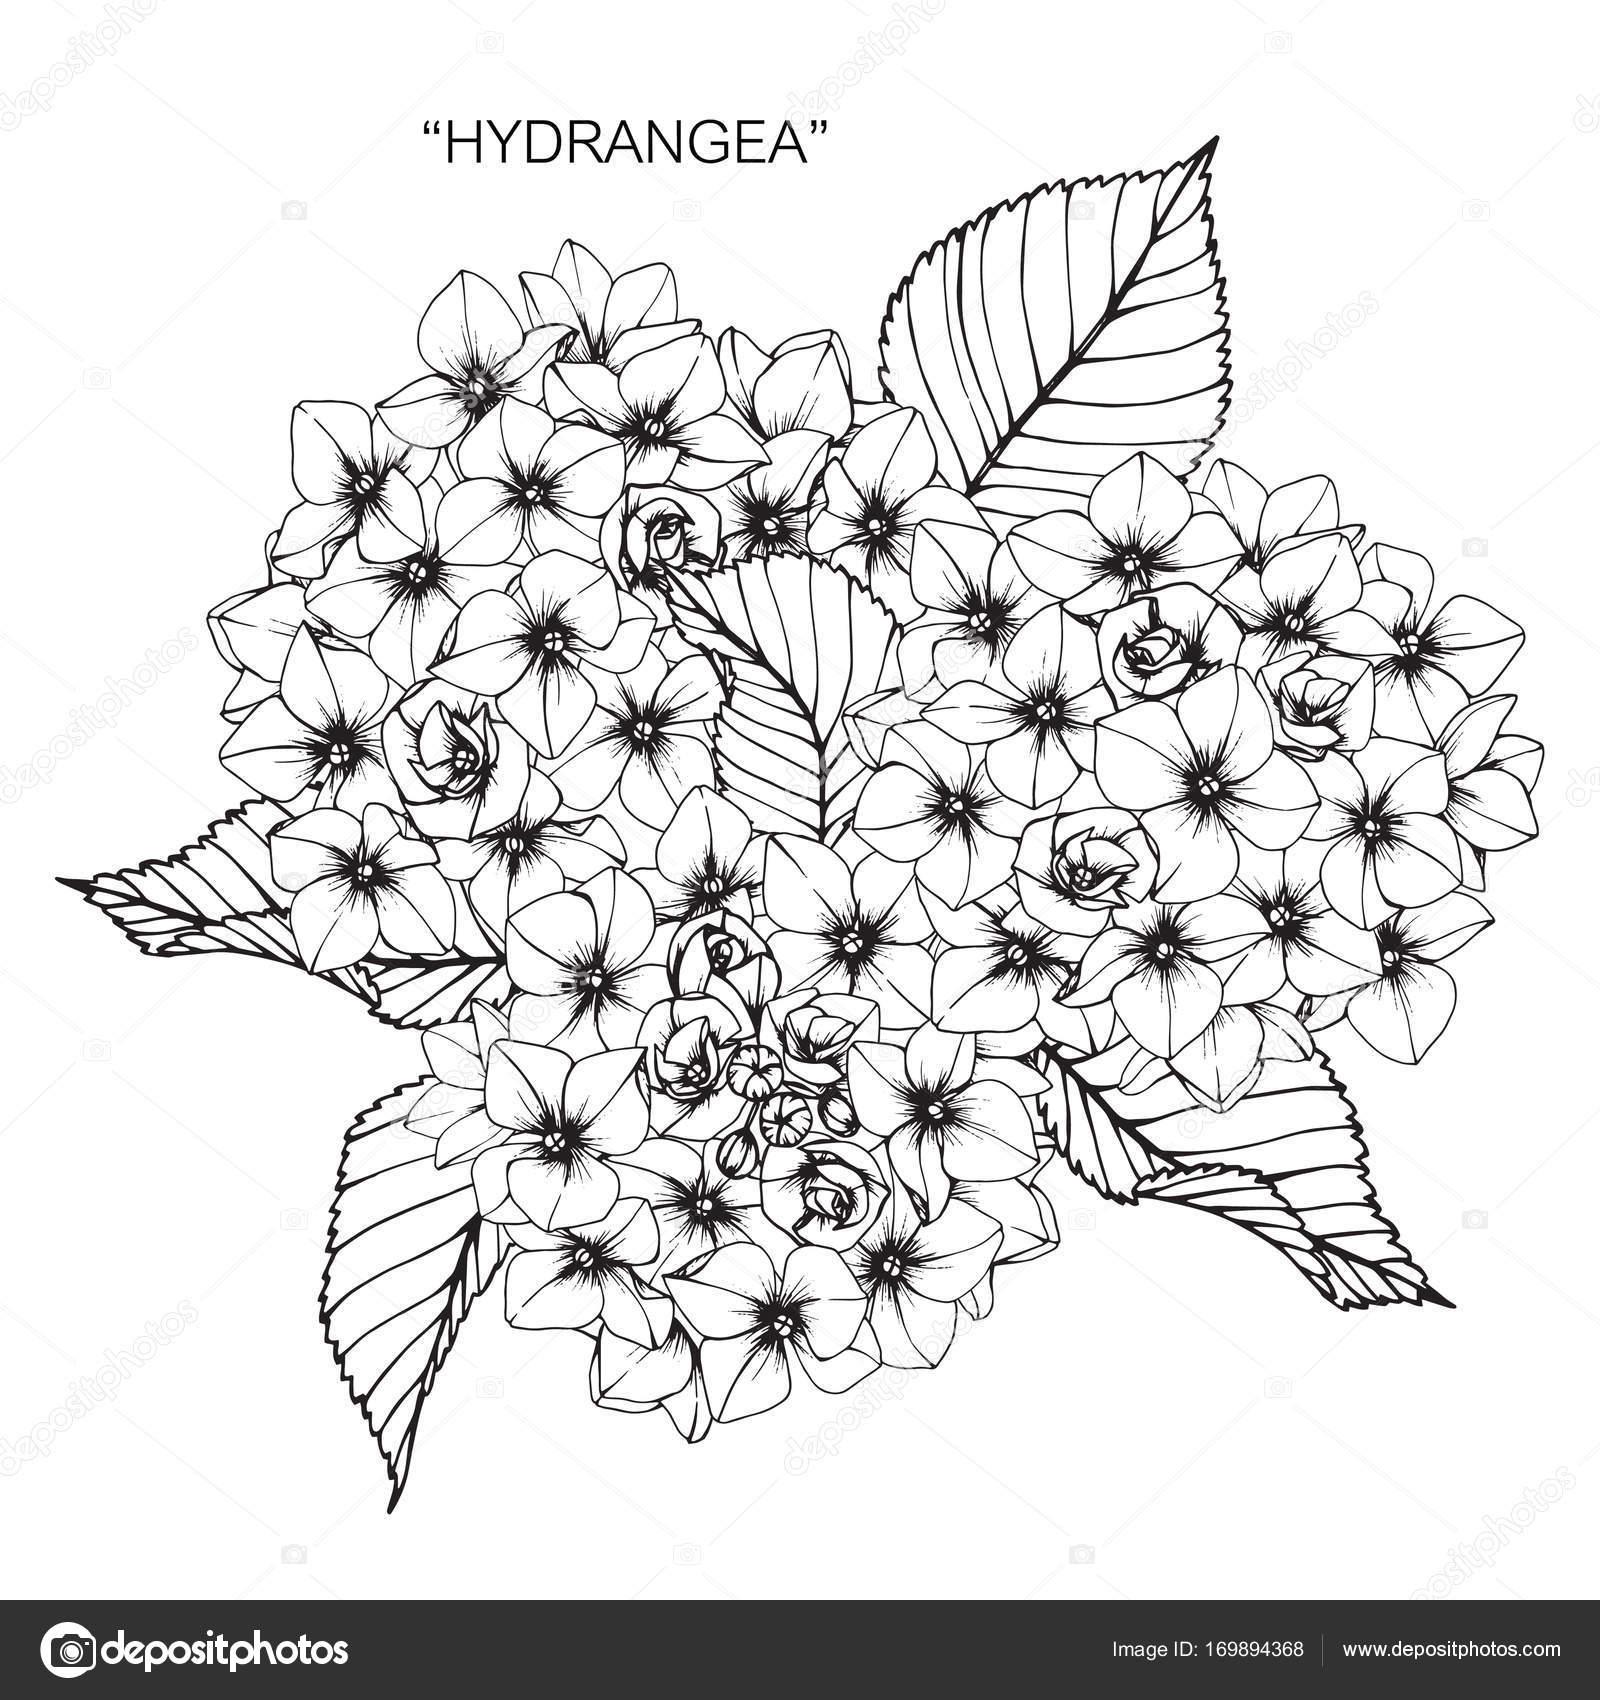 Dibujos Flores Hortensias Flor Hortensia Dibujo Dibujo Con Linea